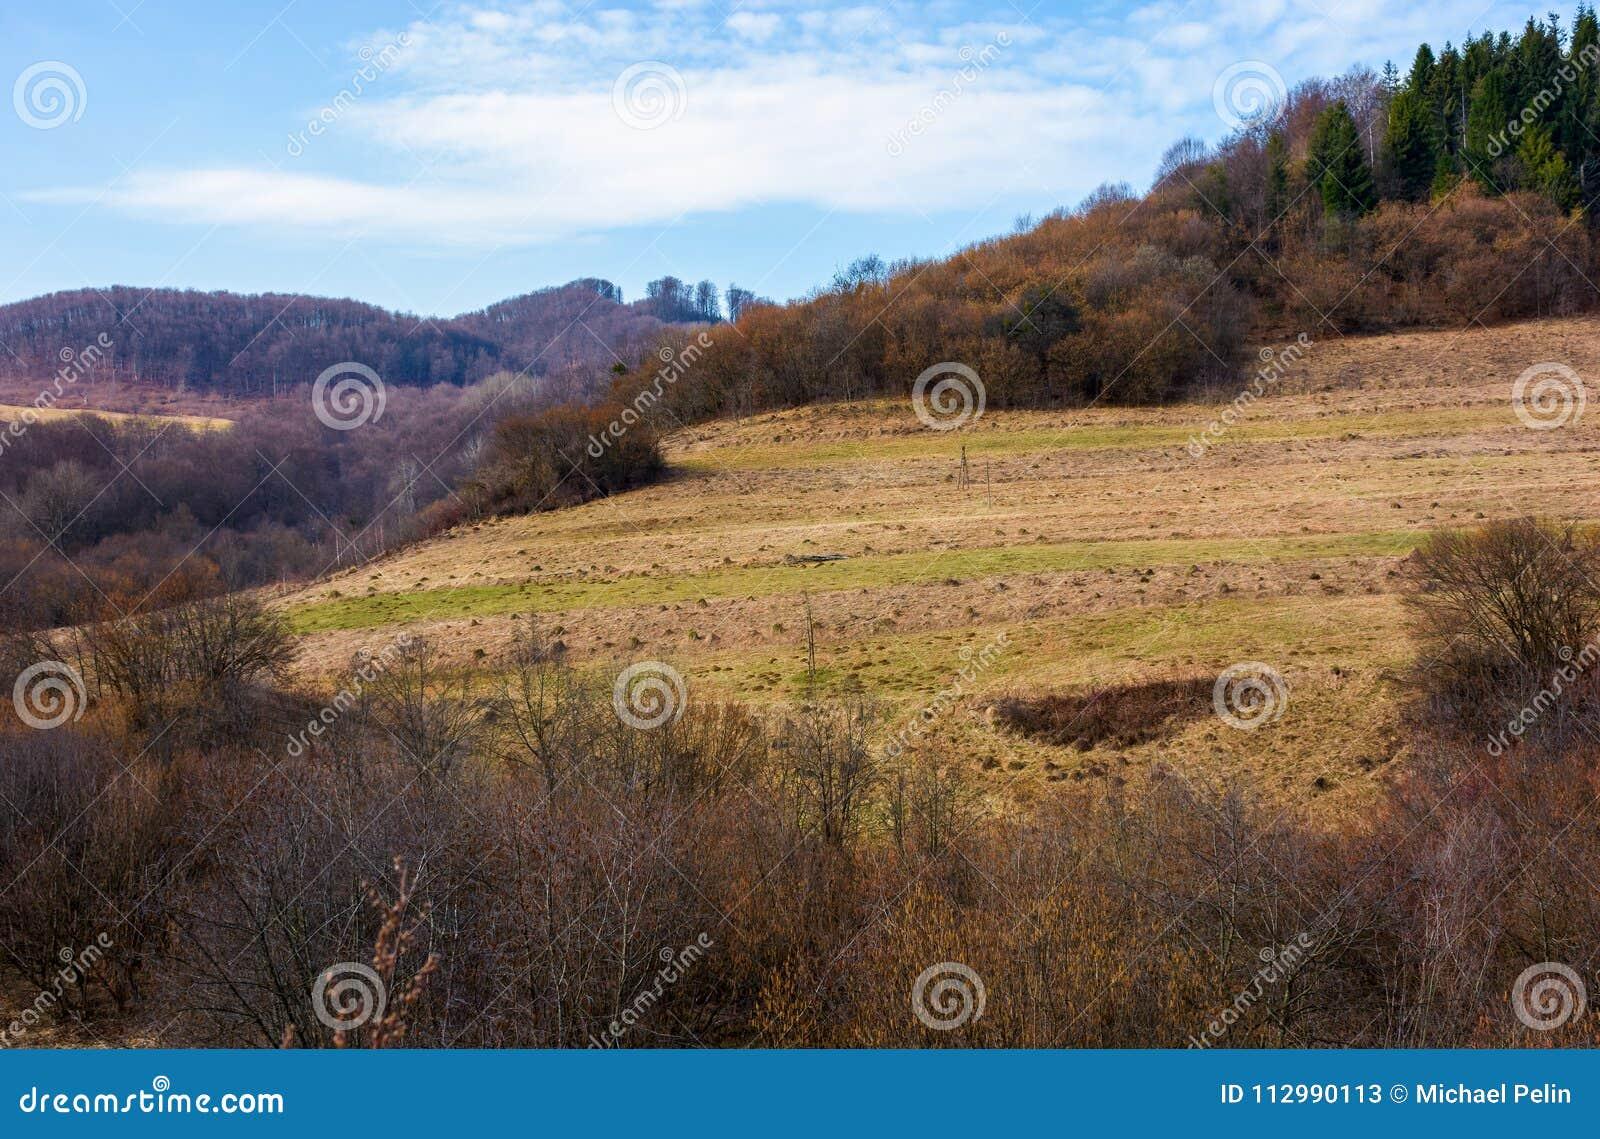 Rural fields on mountain slopes in springtime